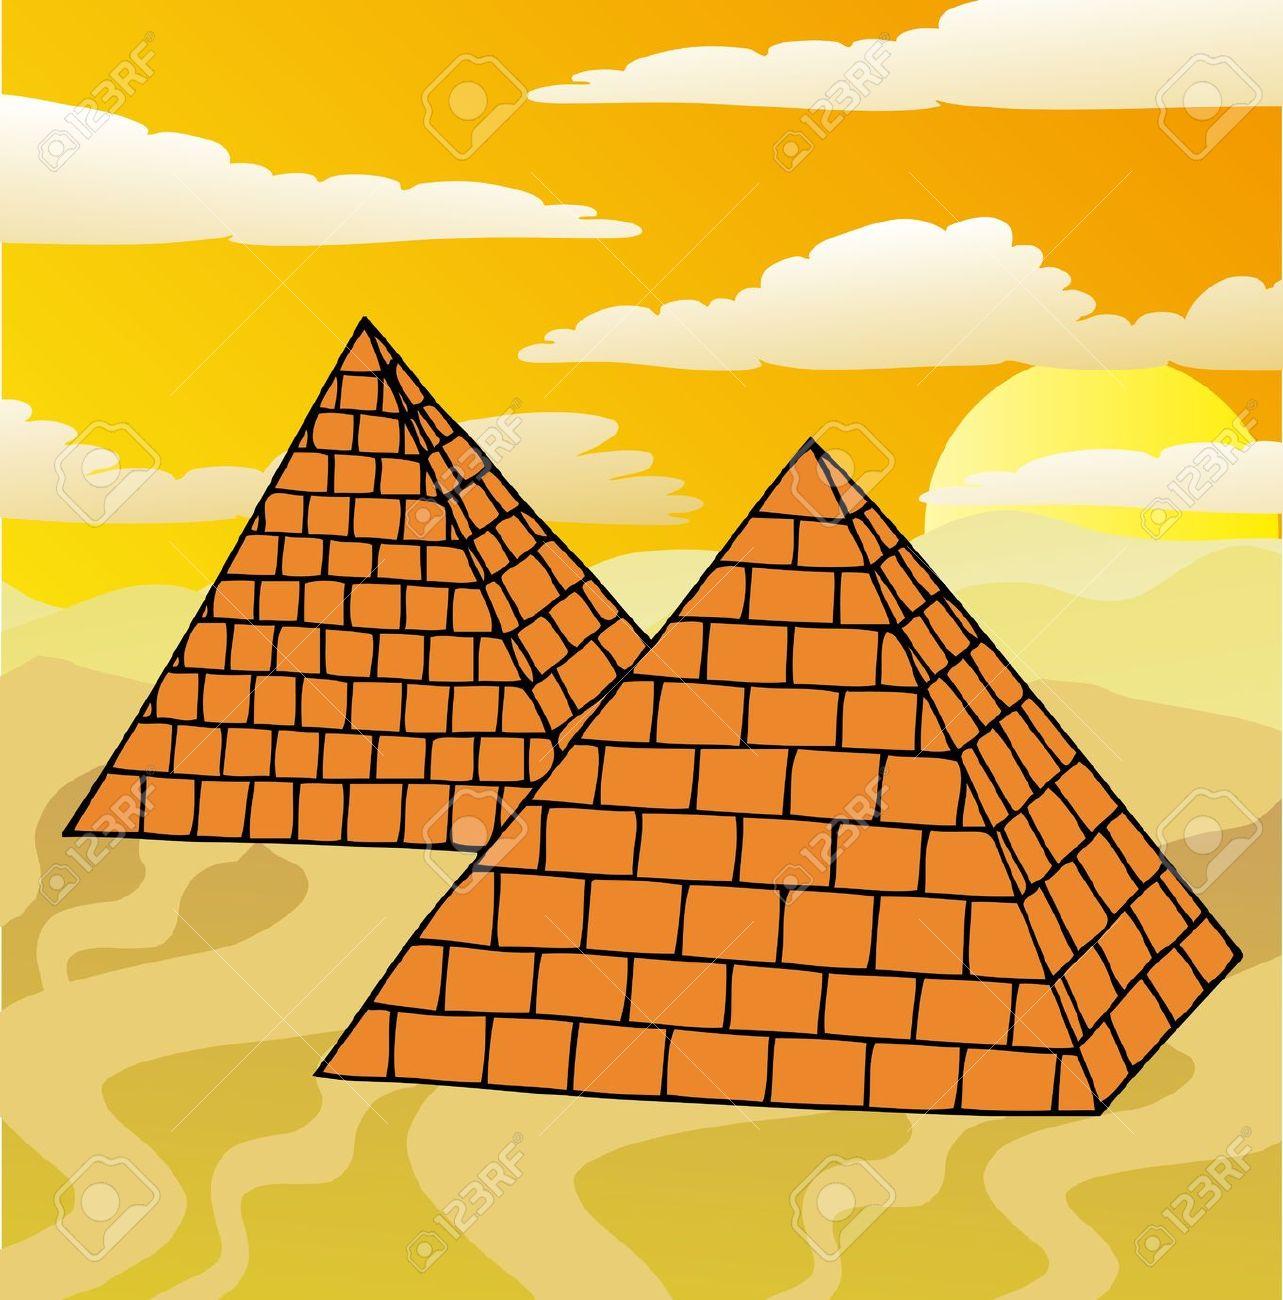 Drawn pyramid cartoon Pyramid Art – Download Clipart